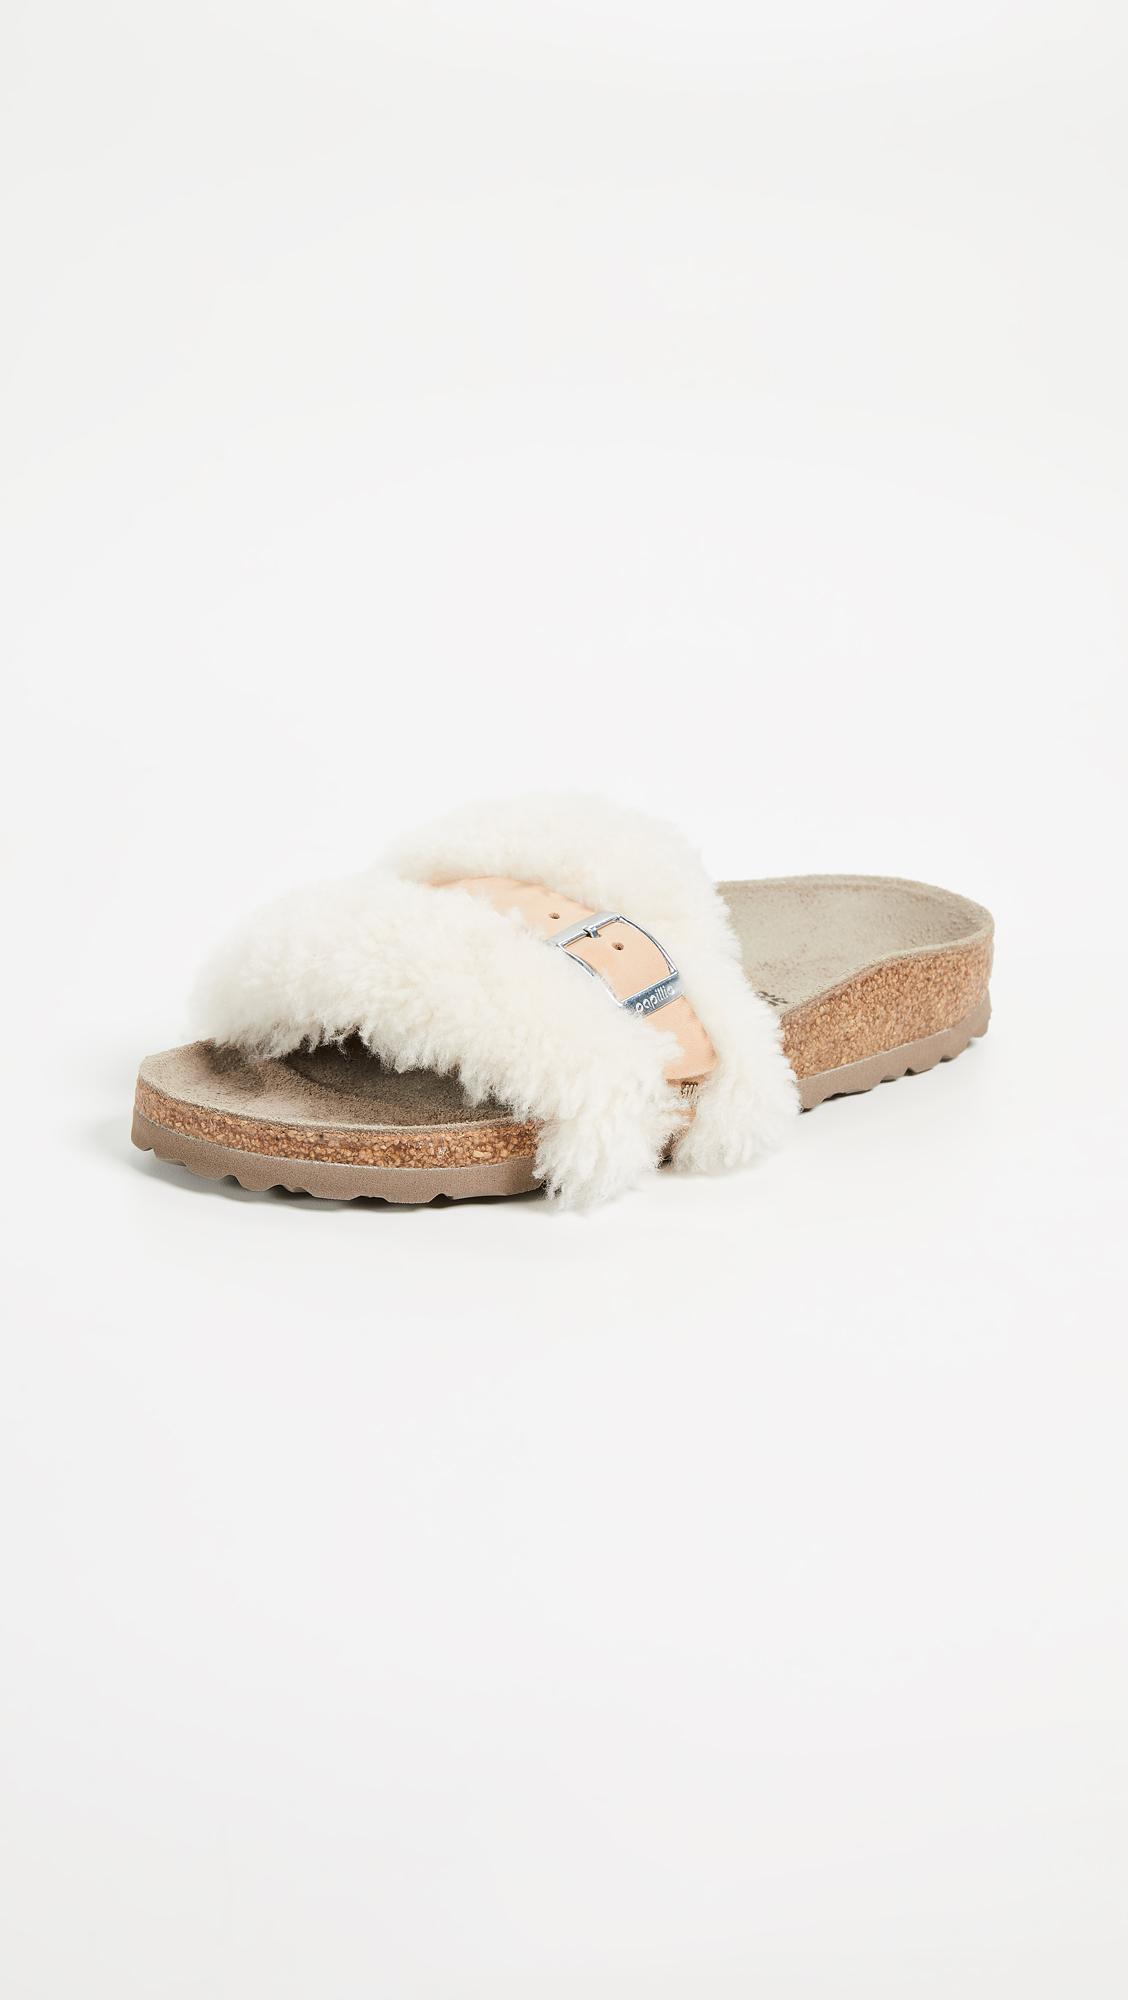 8fe29256d33 Lyst - Birkenstock Carmen Shearling Sandals - Save 17%